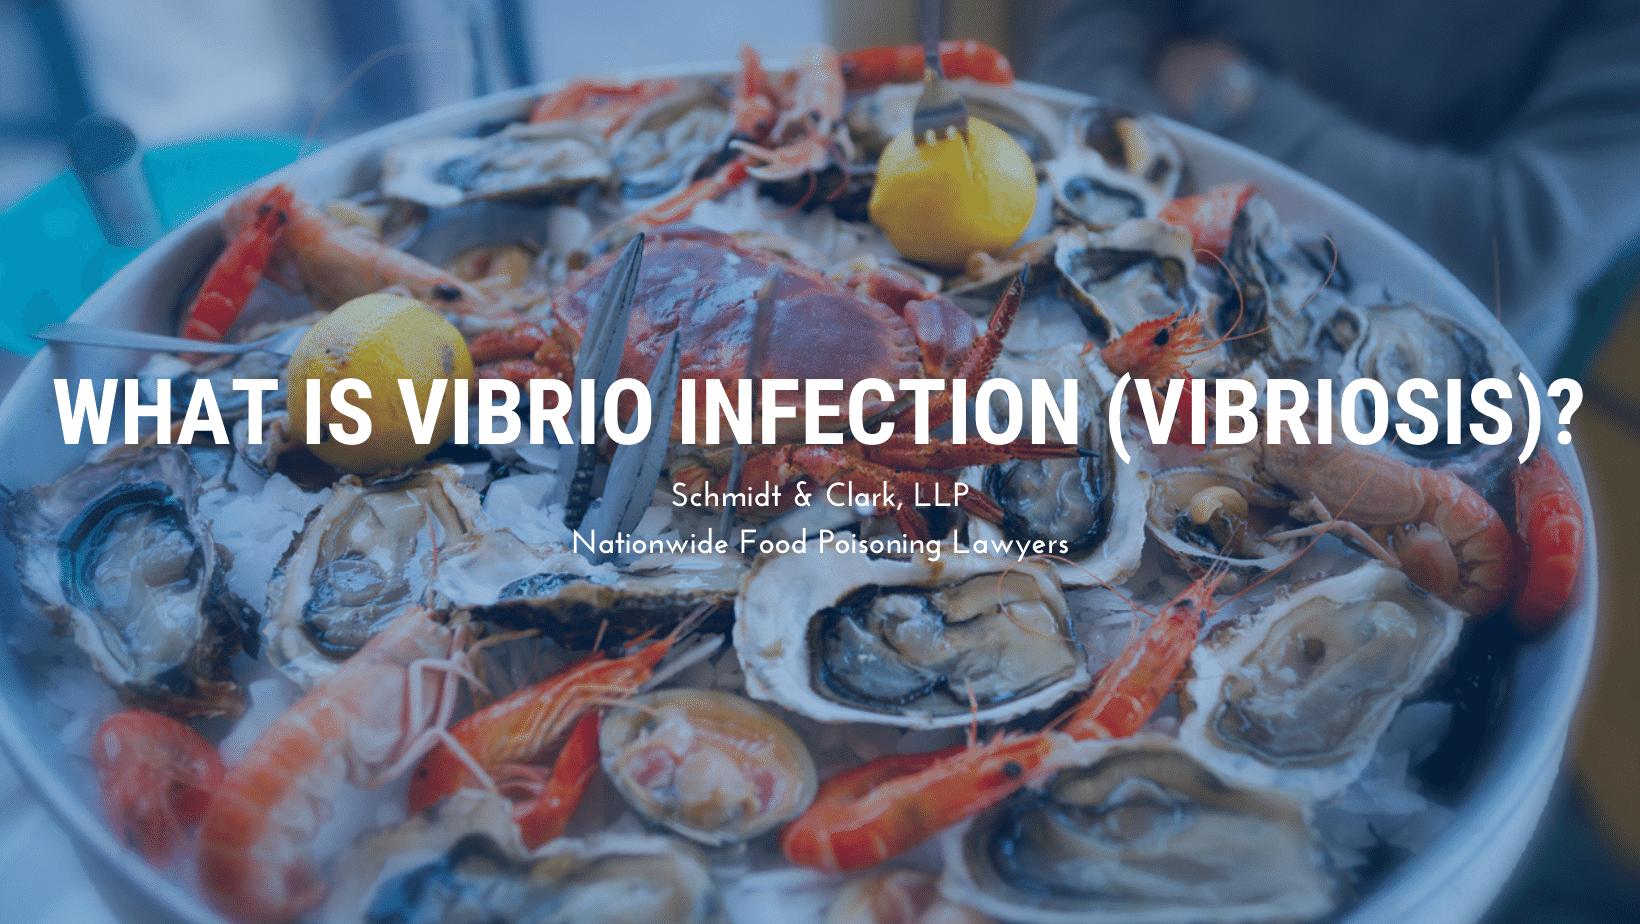 Vibrio Infection vibriosis